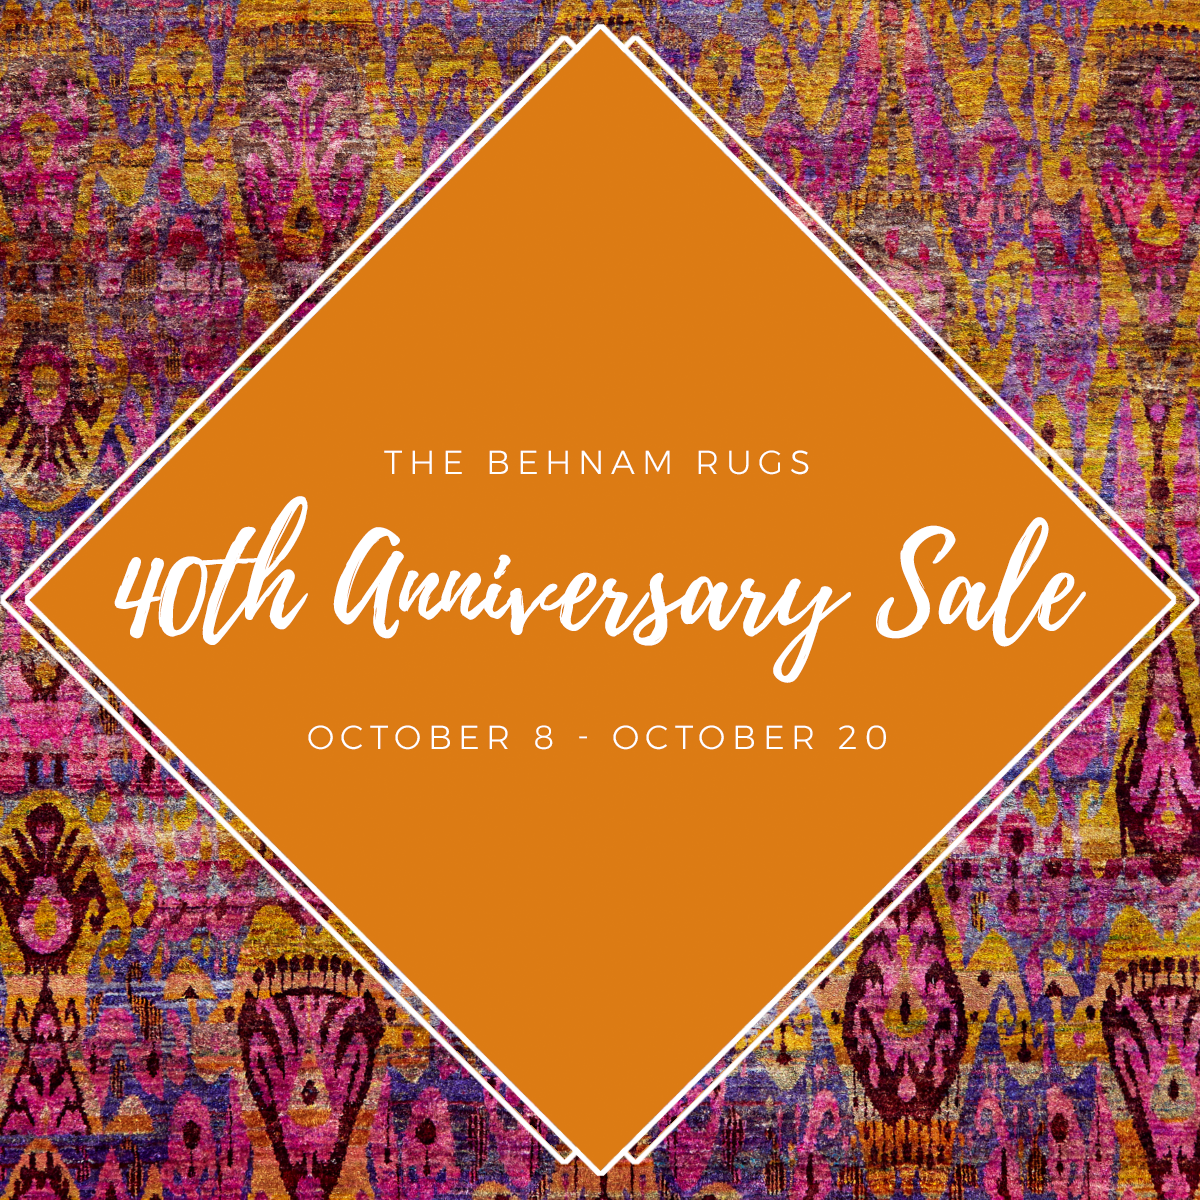 Behnam Rugs 40th Anniversary Sale